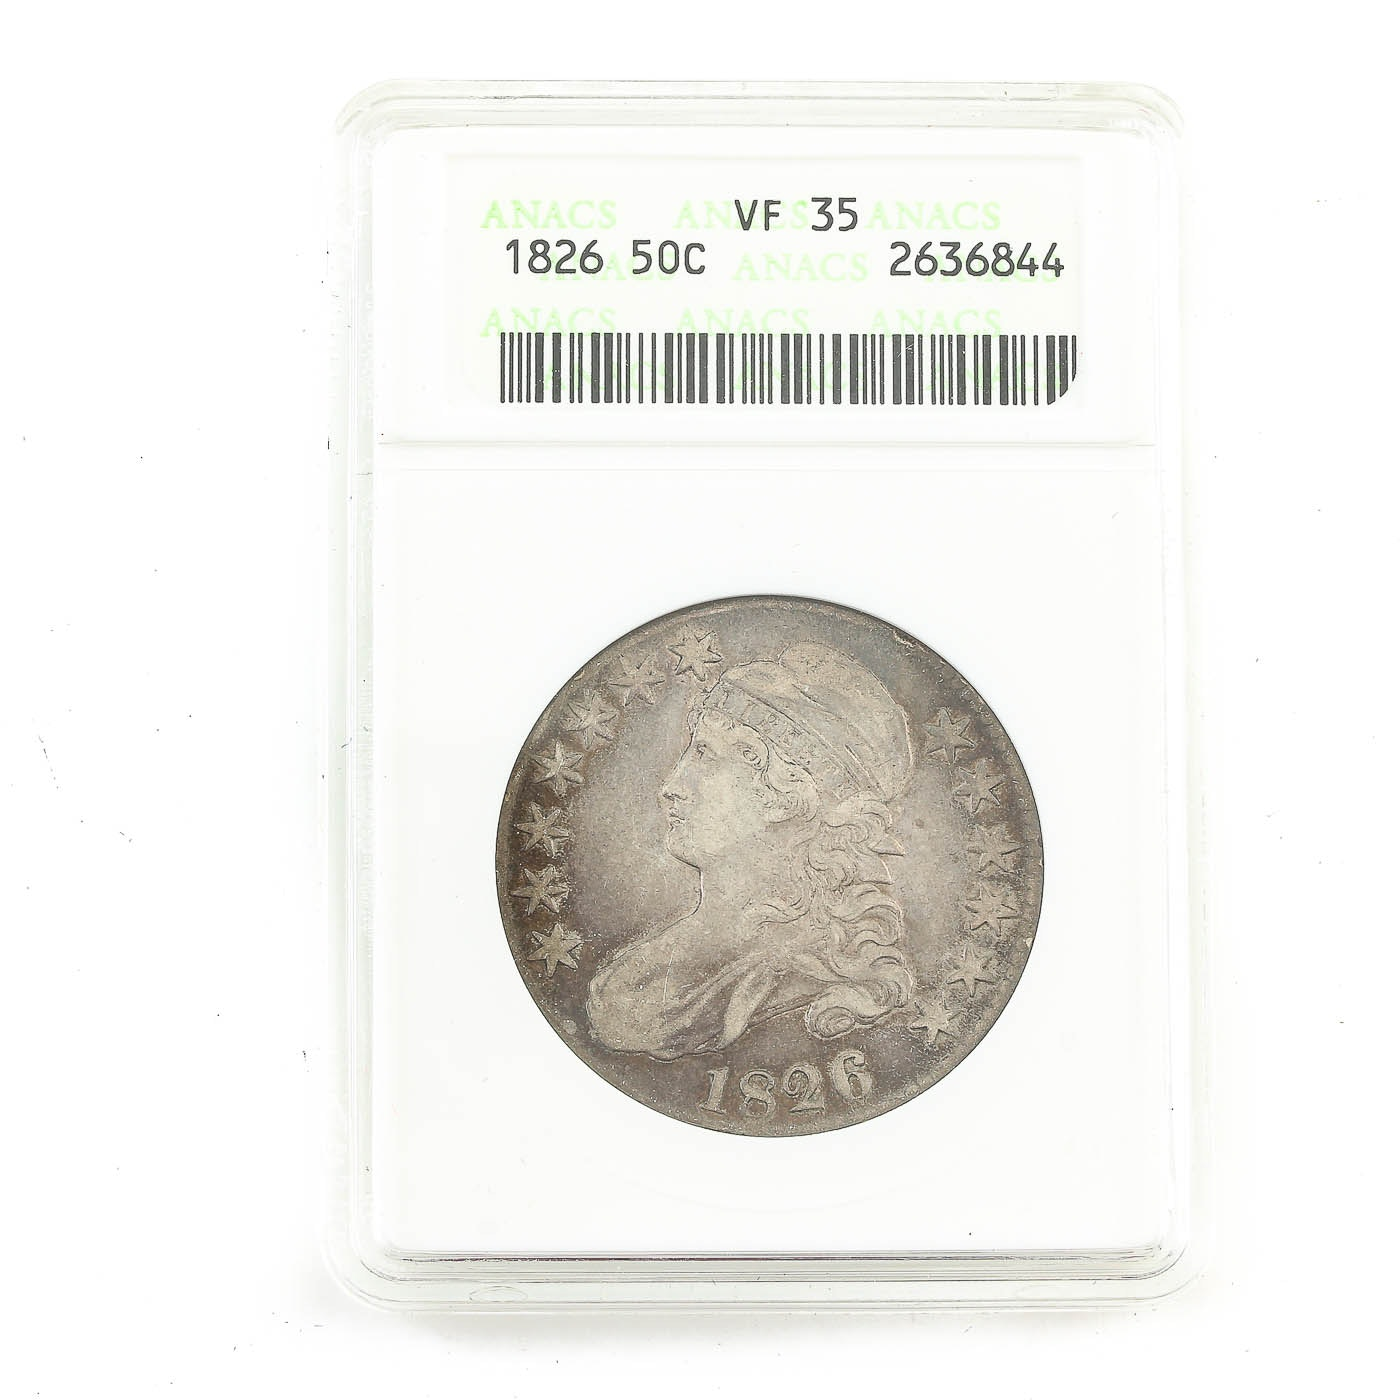 ANACS graded VF35 Capped Bust Silver Half Dollar